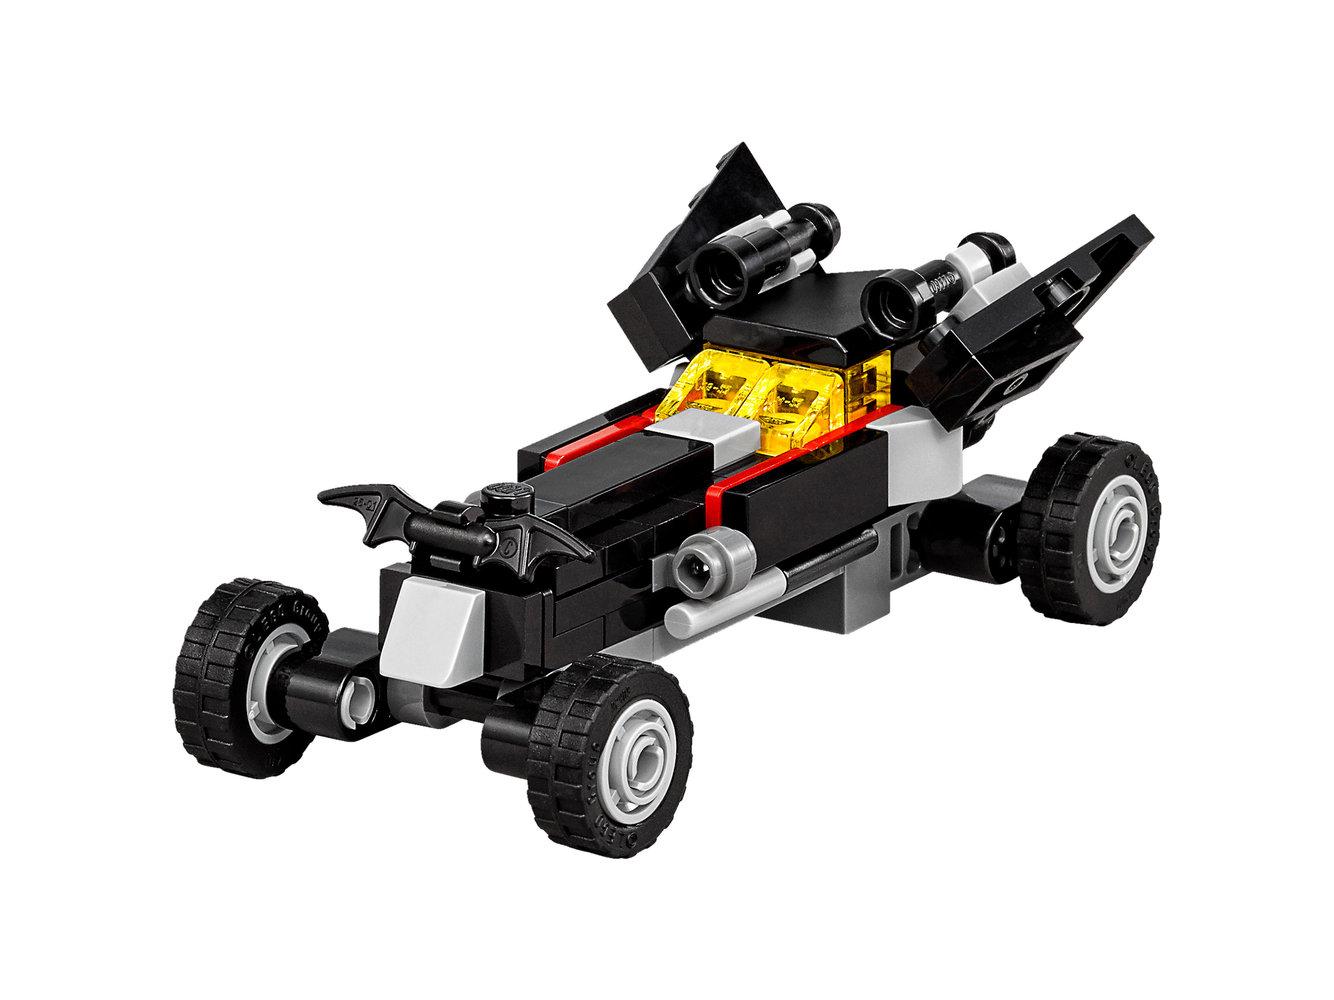 The Mini Batmobile